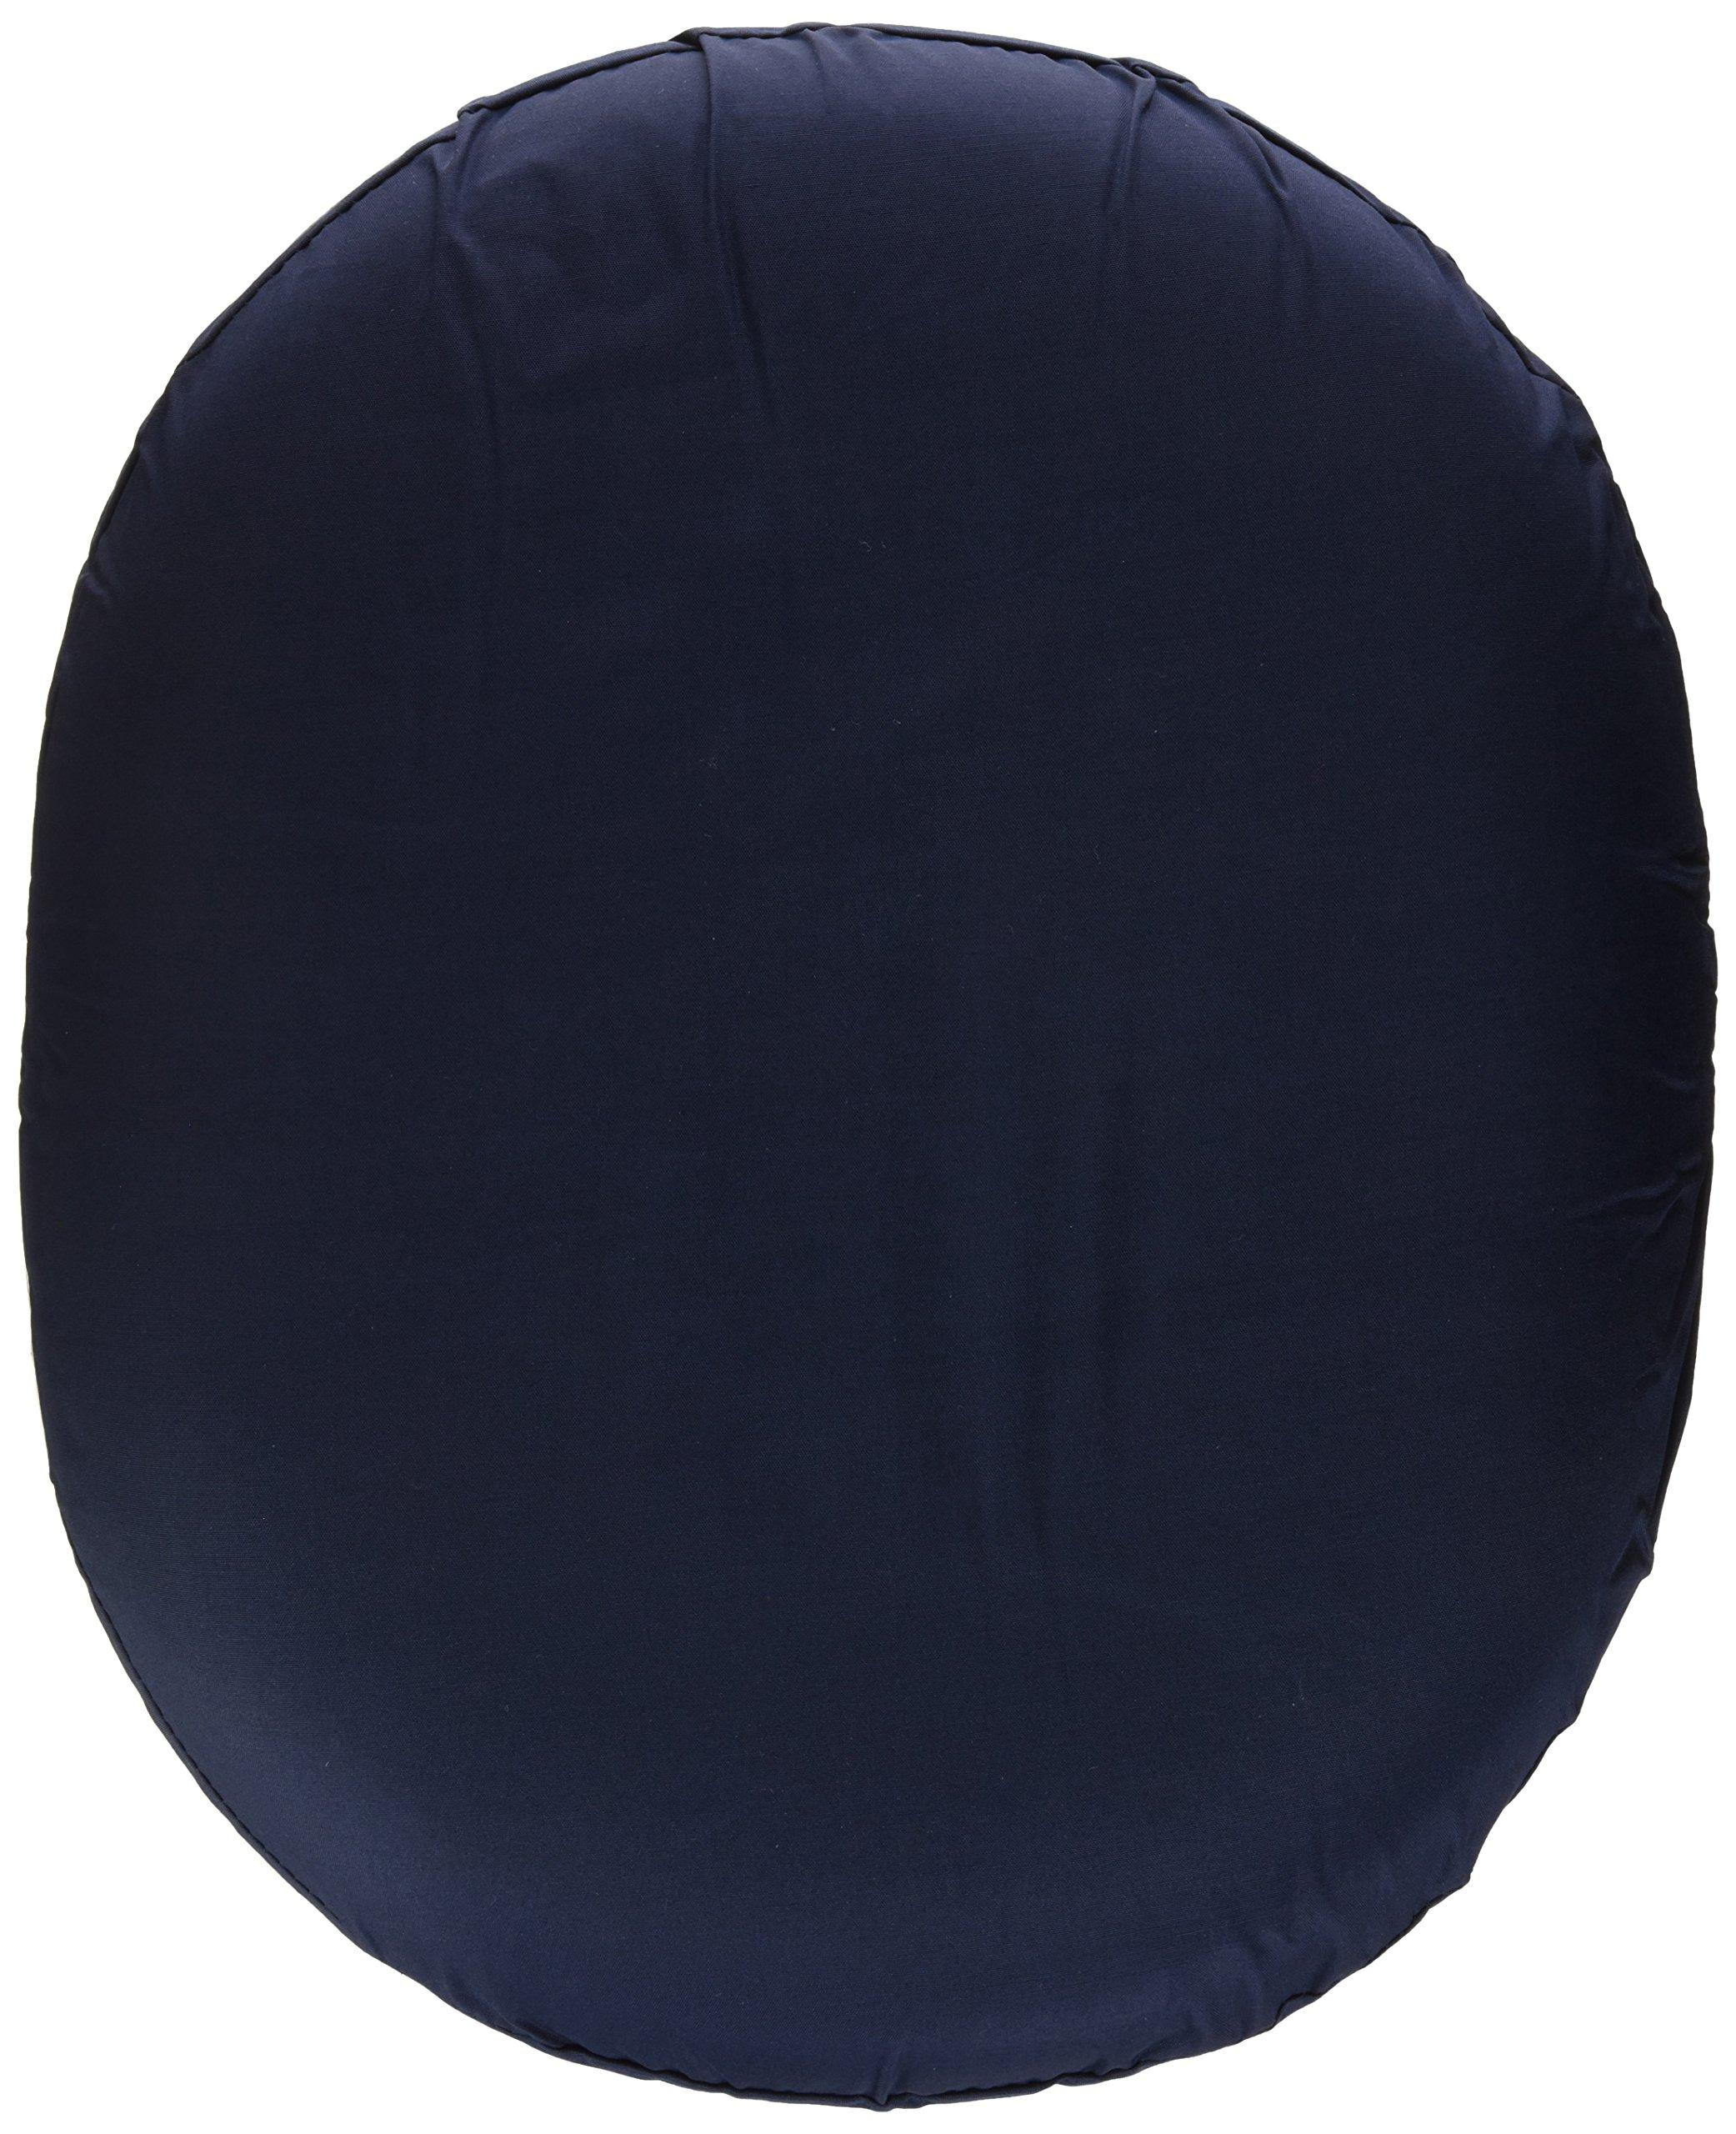 DMI 14-inch Molded Foam Ring Donut Seat Cushion Pillow for Hemorrhoids, Back Pain, Navy